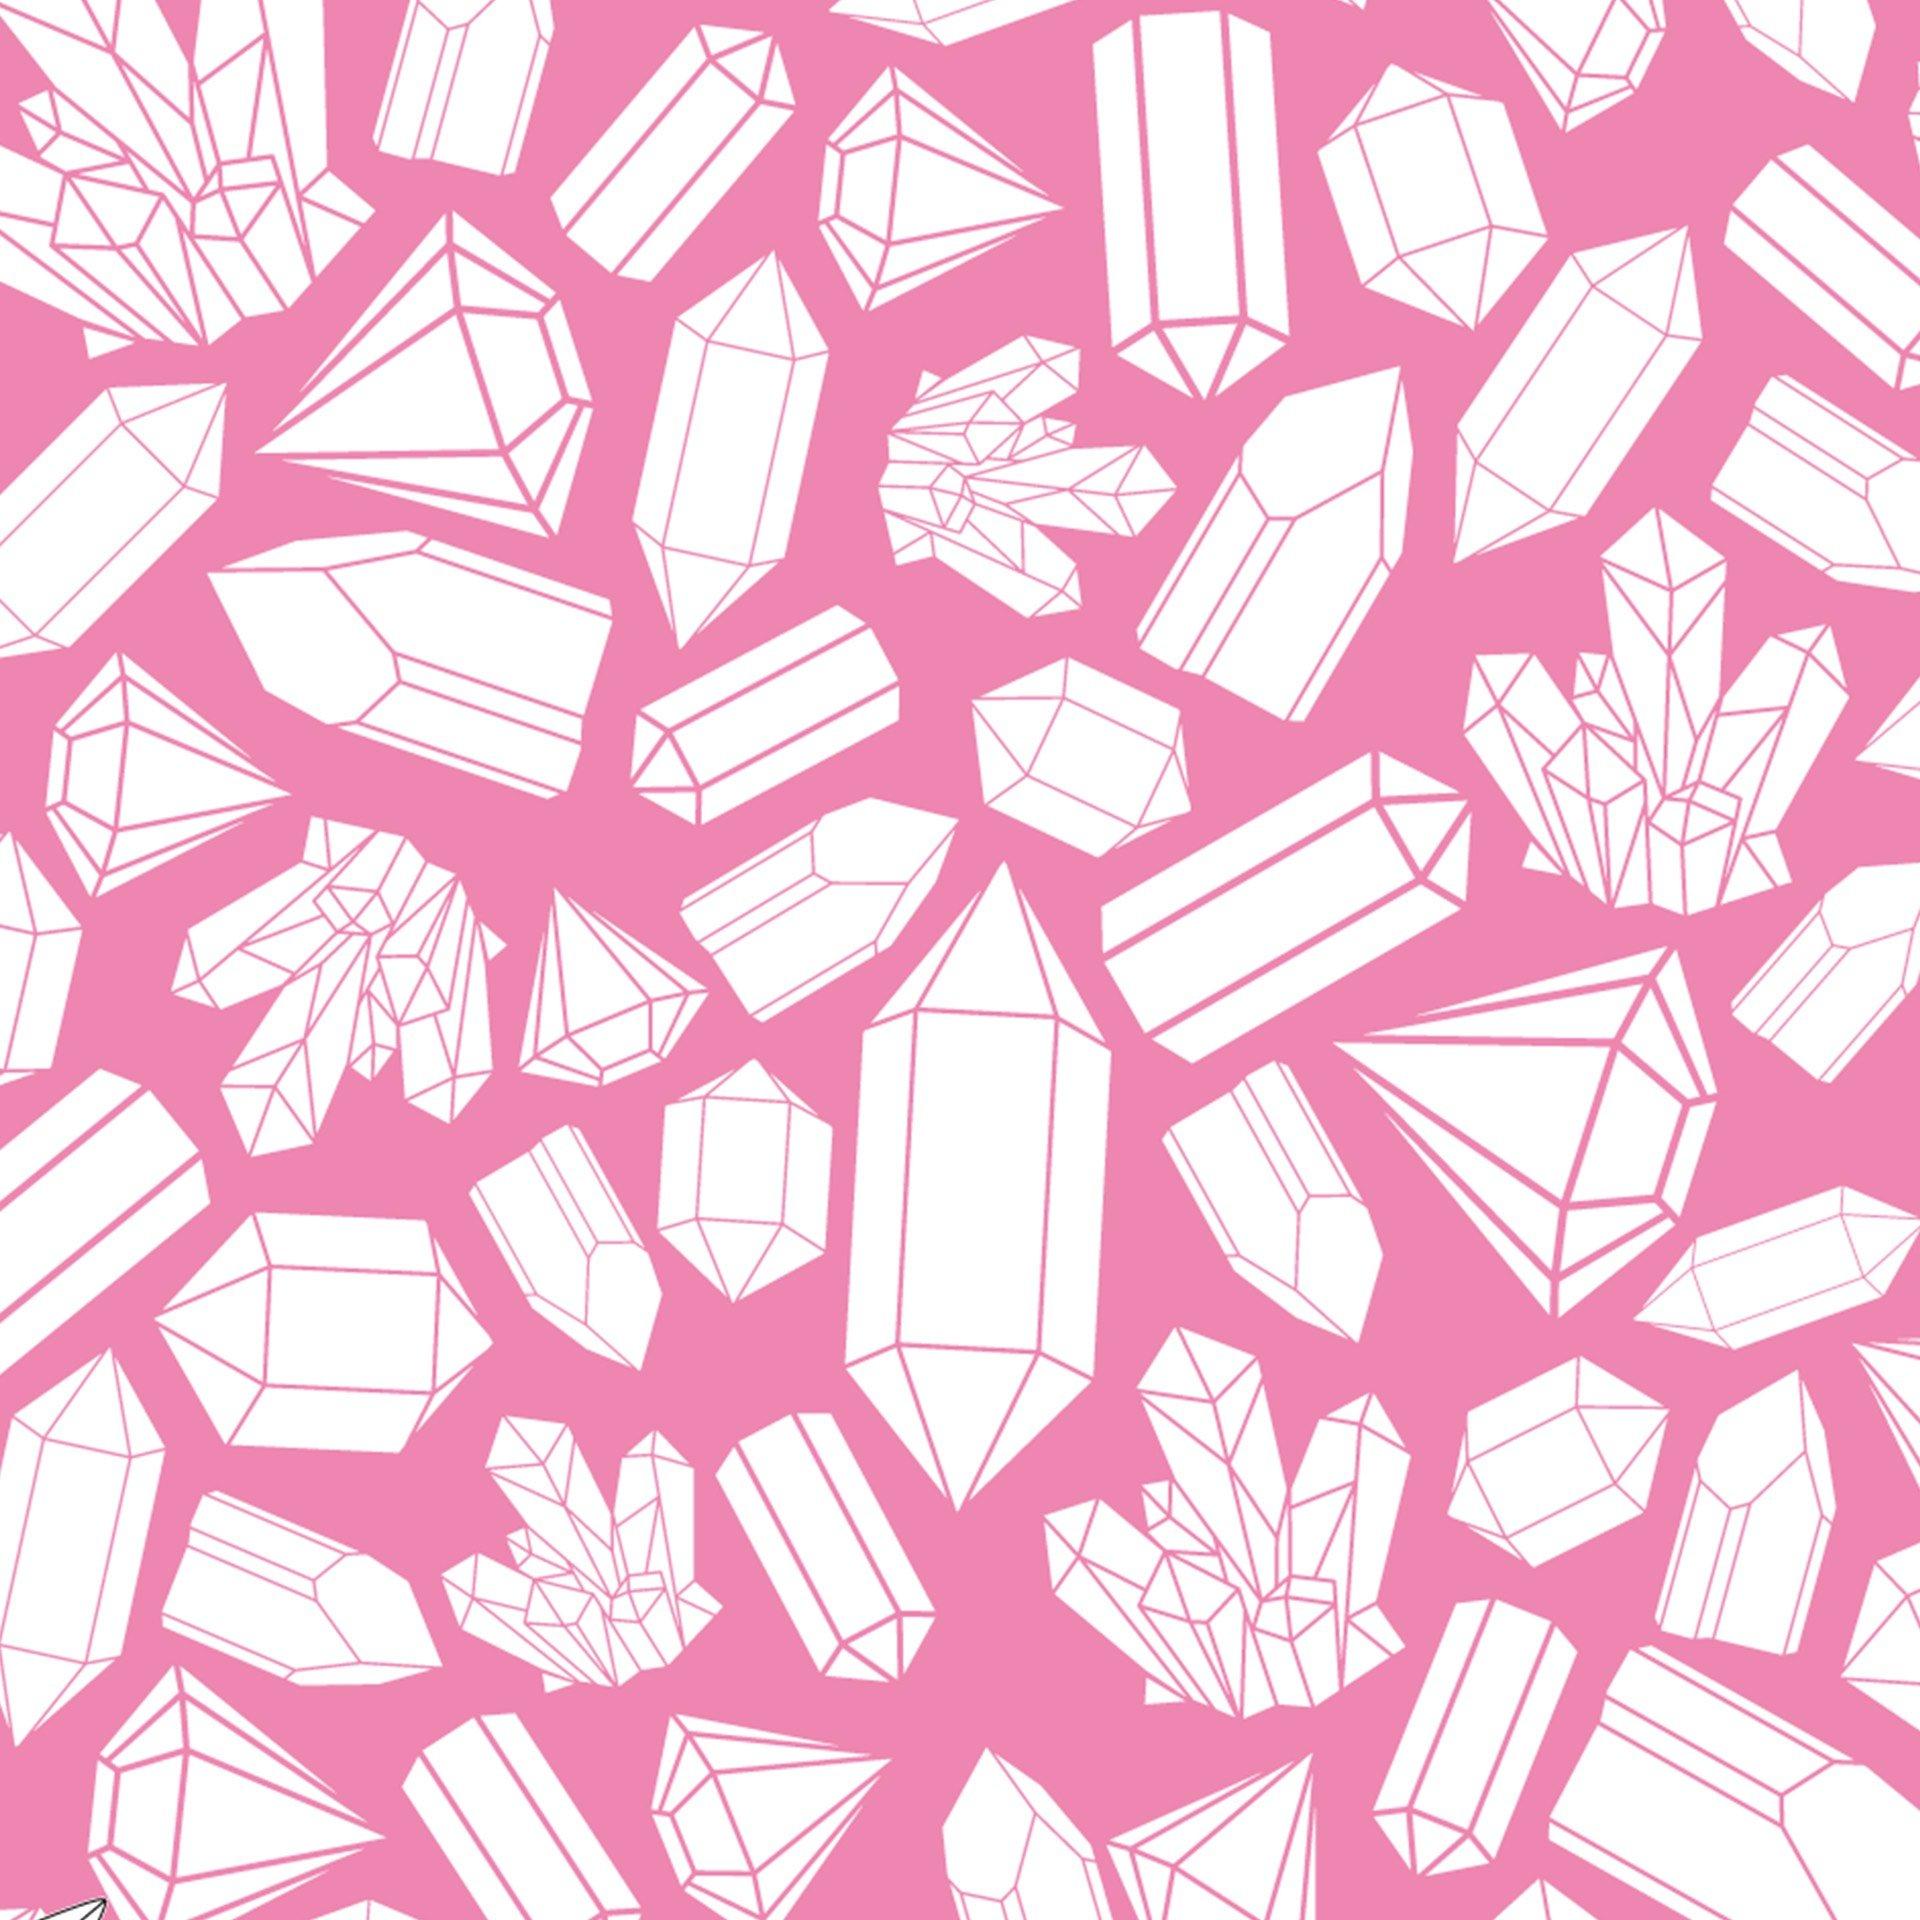 image regarding Origami Paper Printable named Crystal Behavior Printable Origami Paper